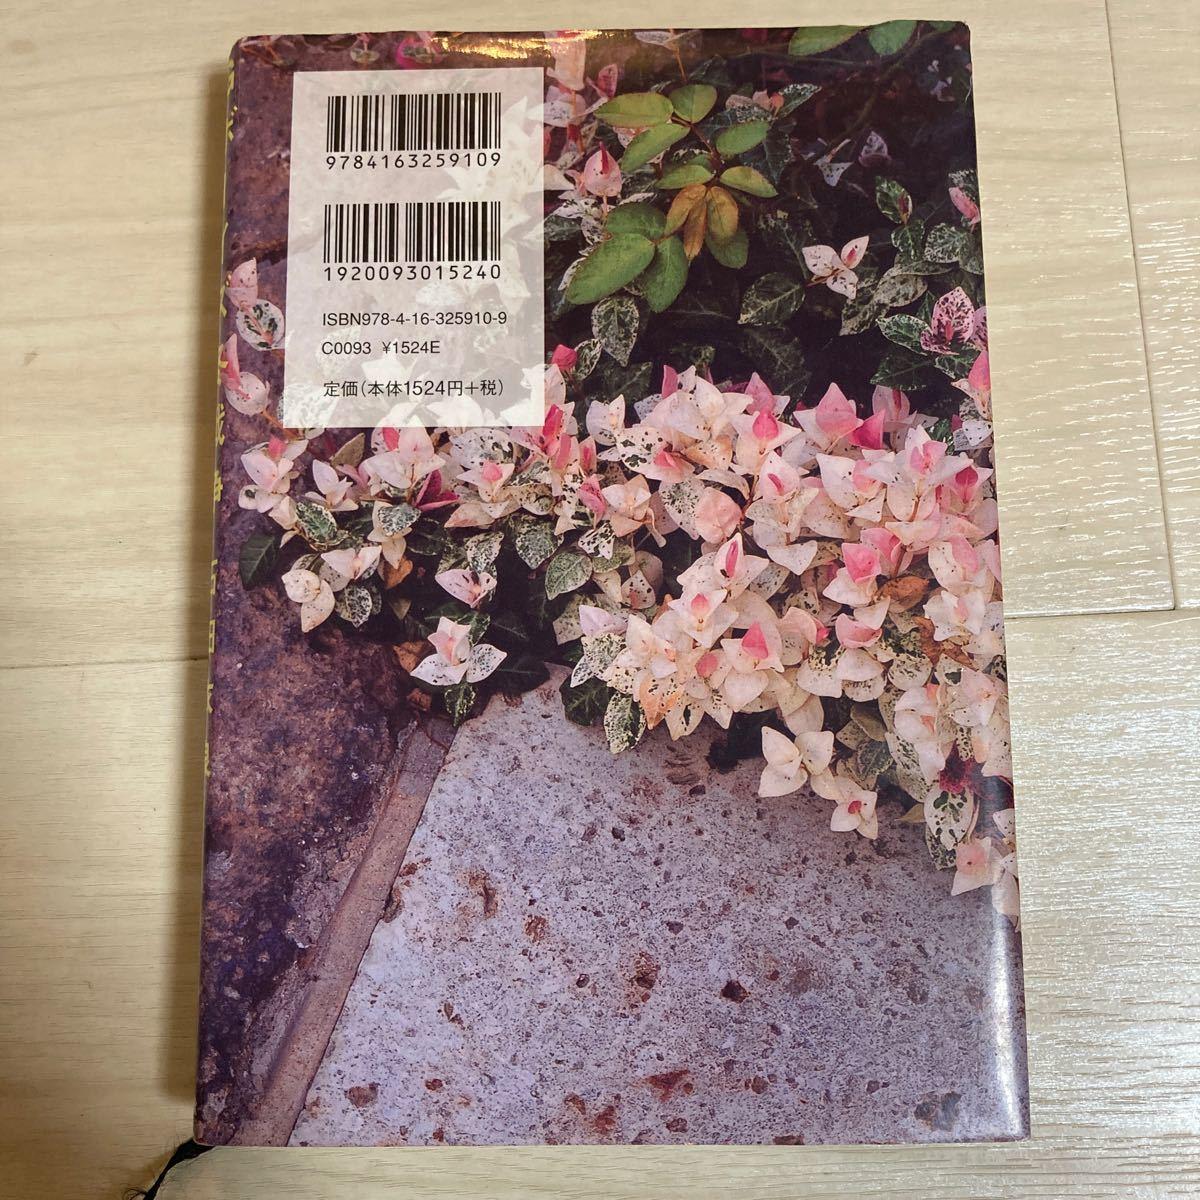 Gボーイズ冬戦争 池袋ウエストゲートパーク VII/石田衣良 【著】